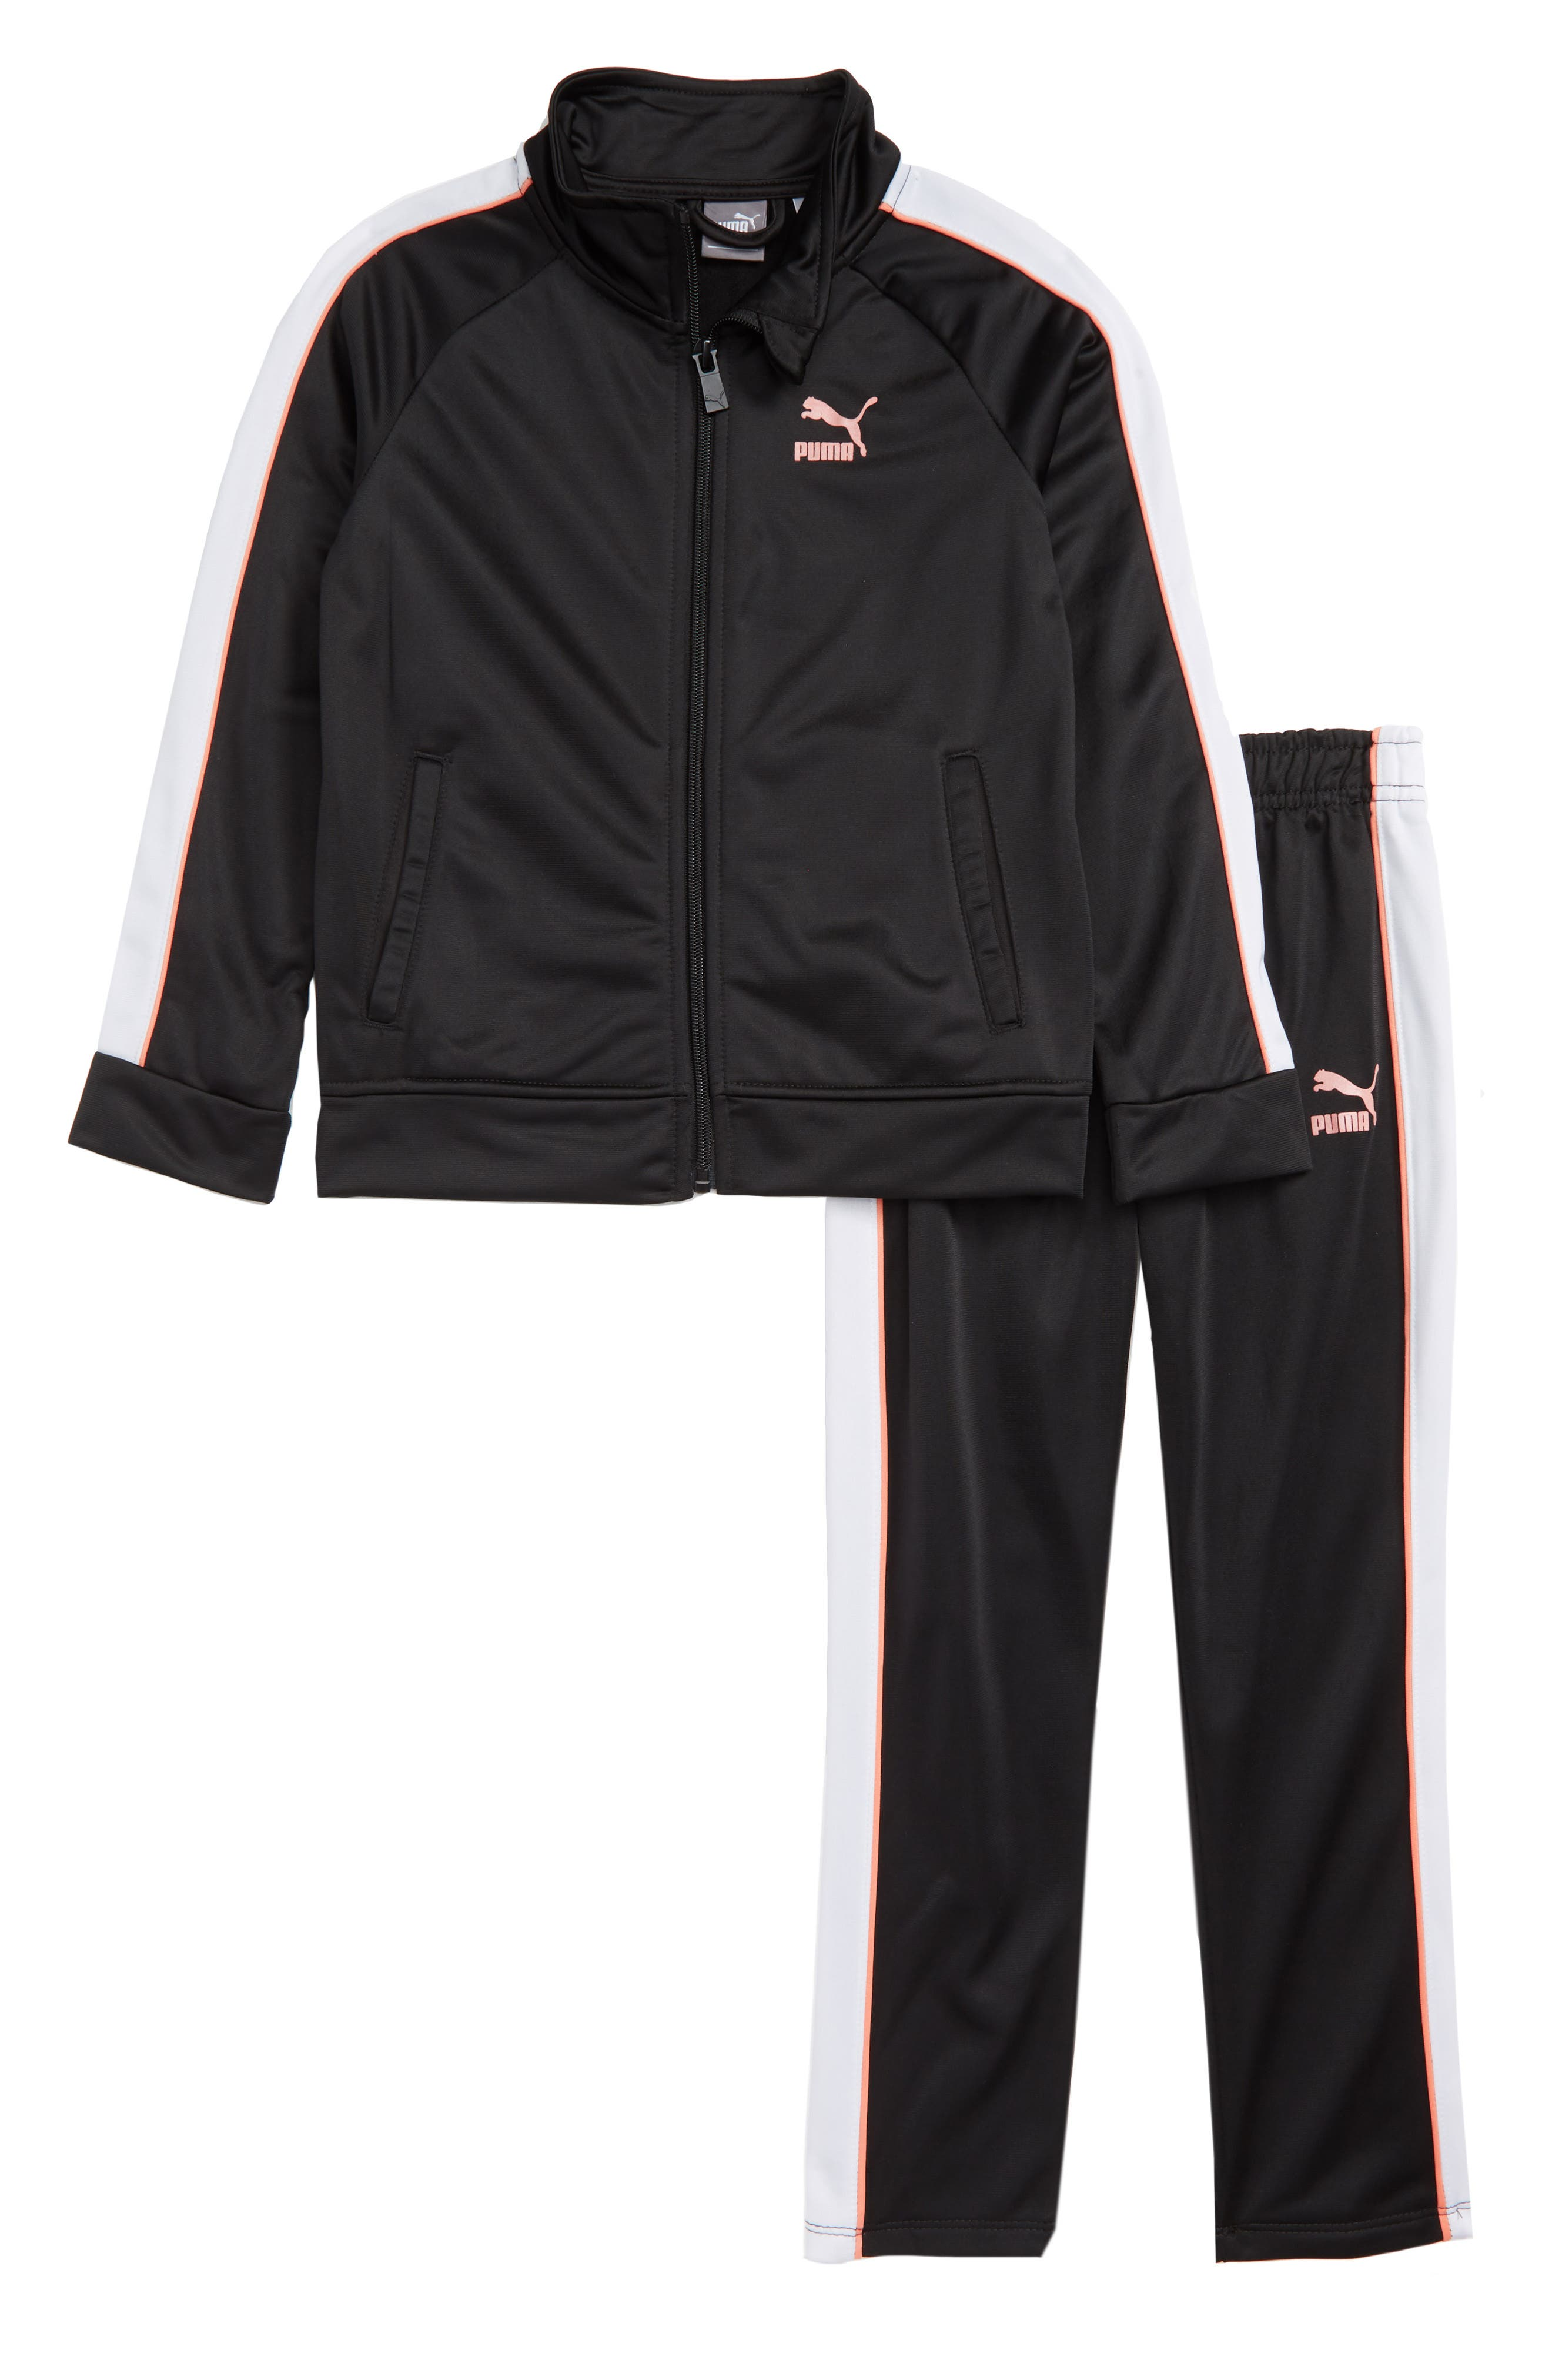 Track Jacket and Pant Set,                         Main,                         color, PUMA BLACK